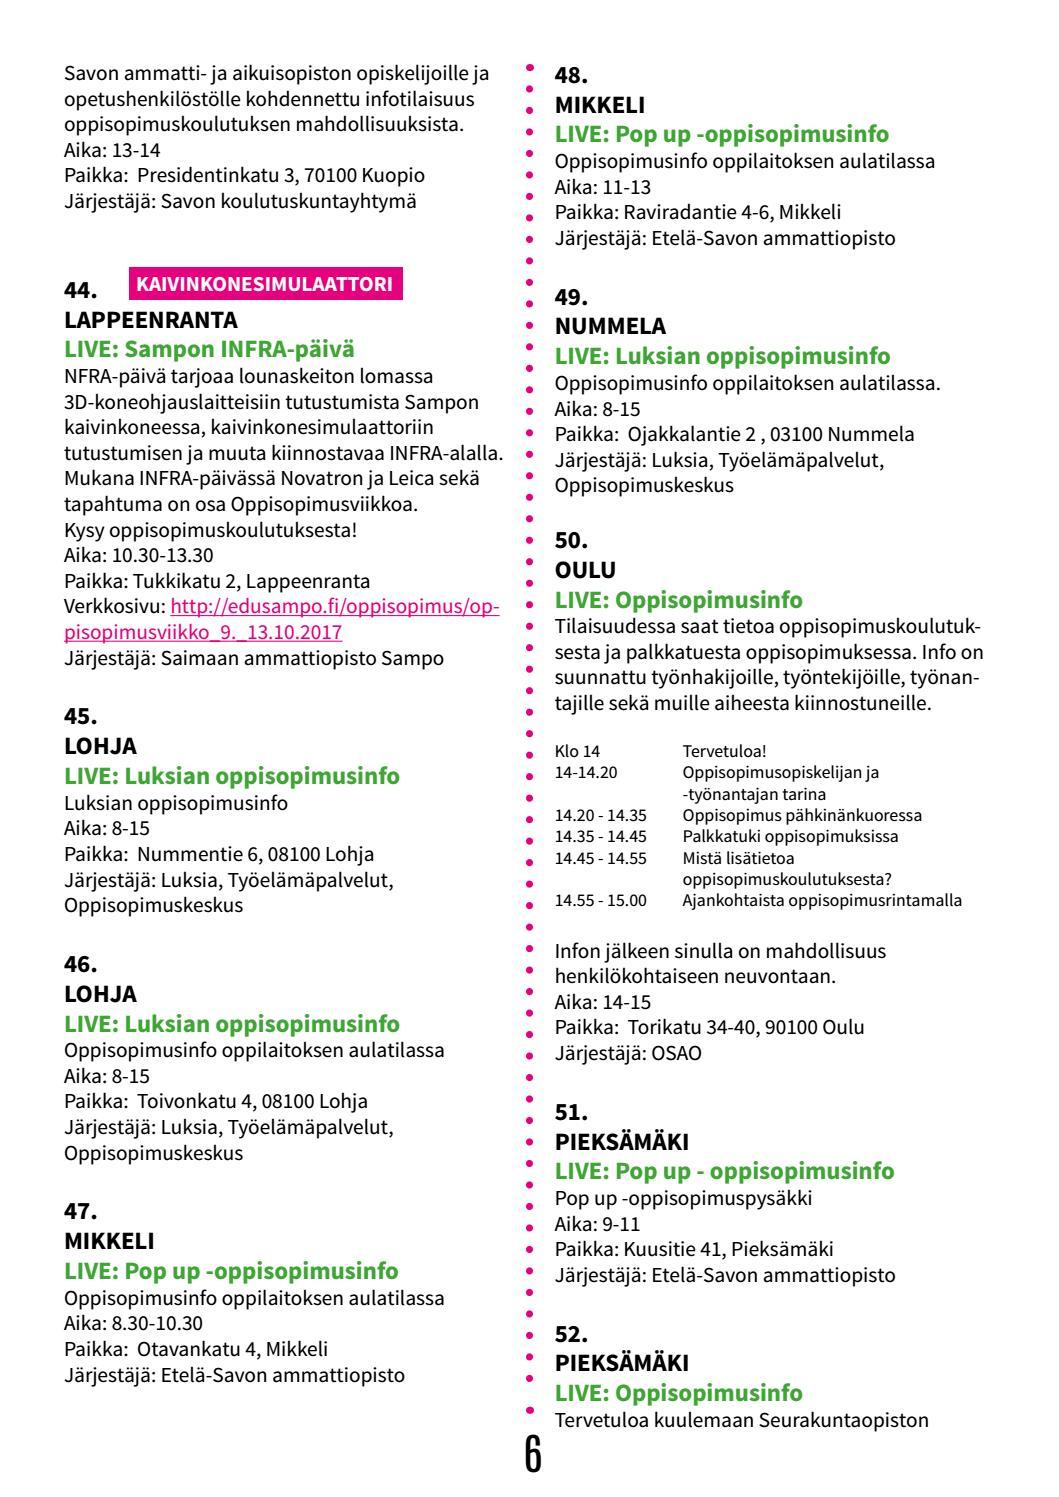 Oppisopimus Kuopio